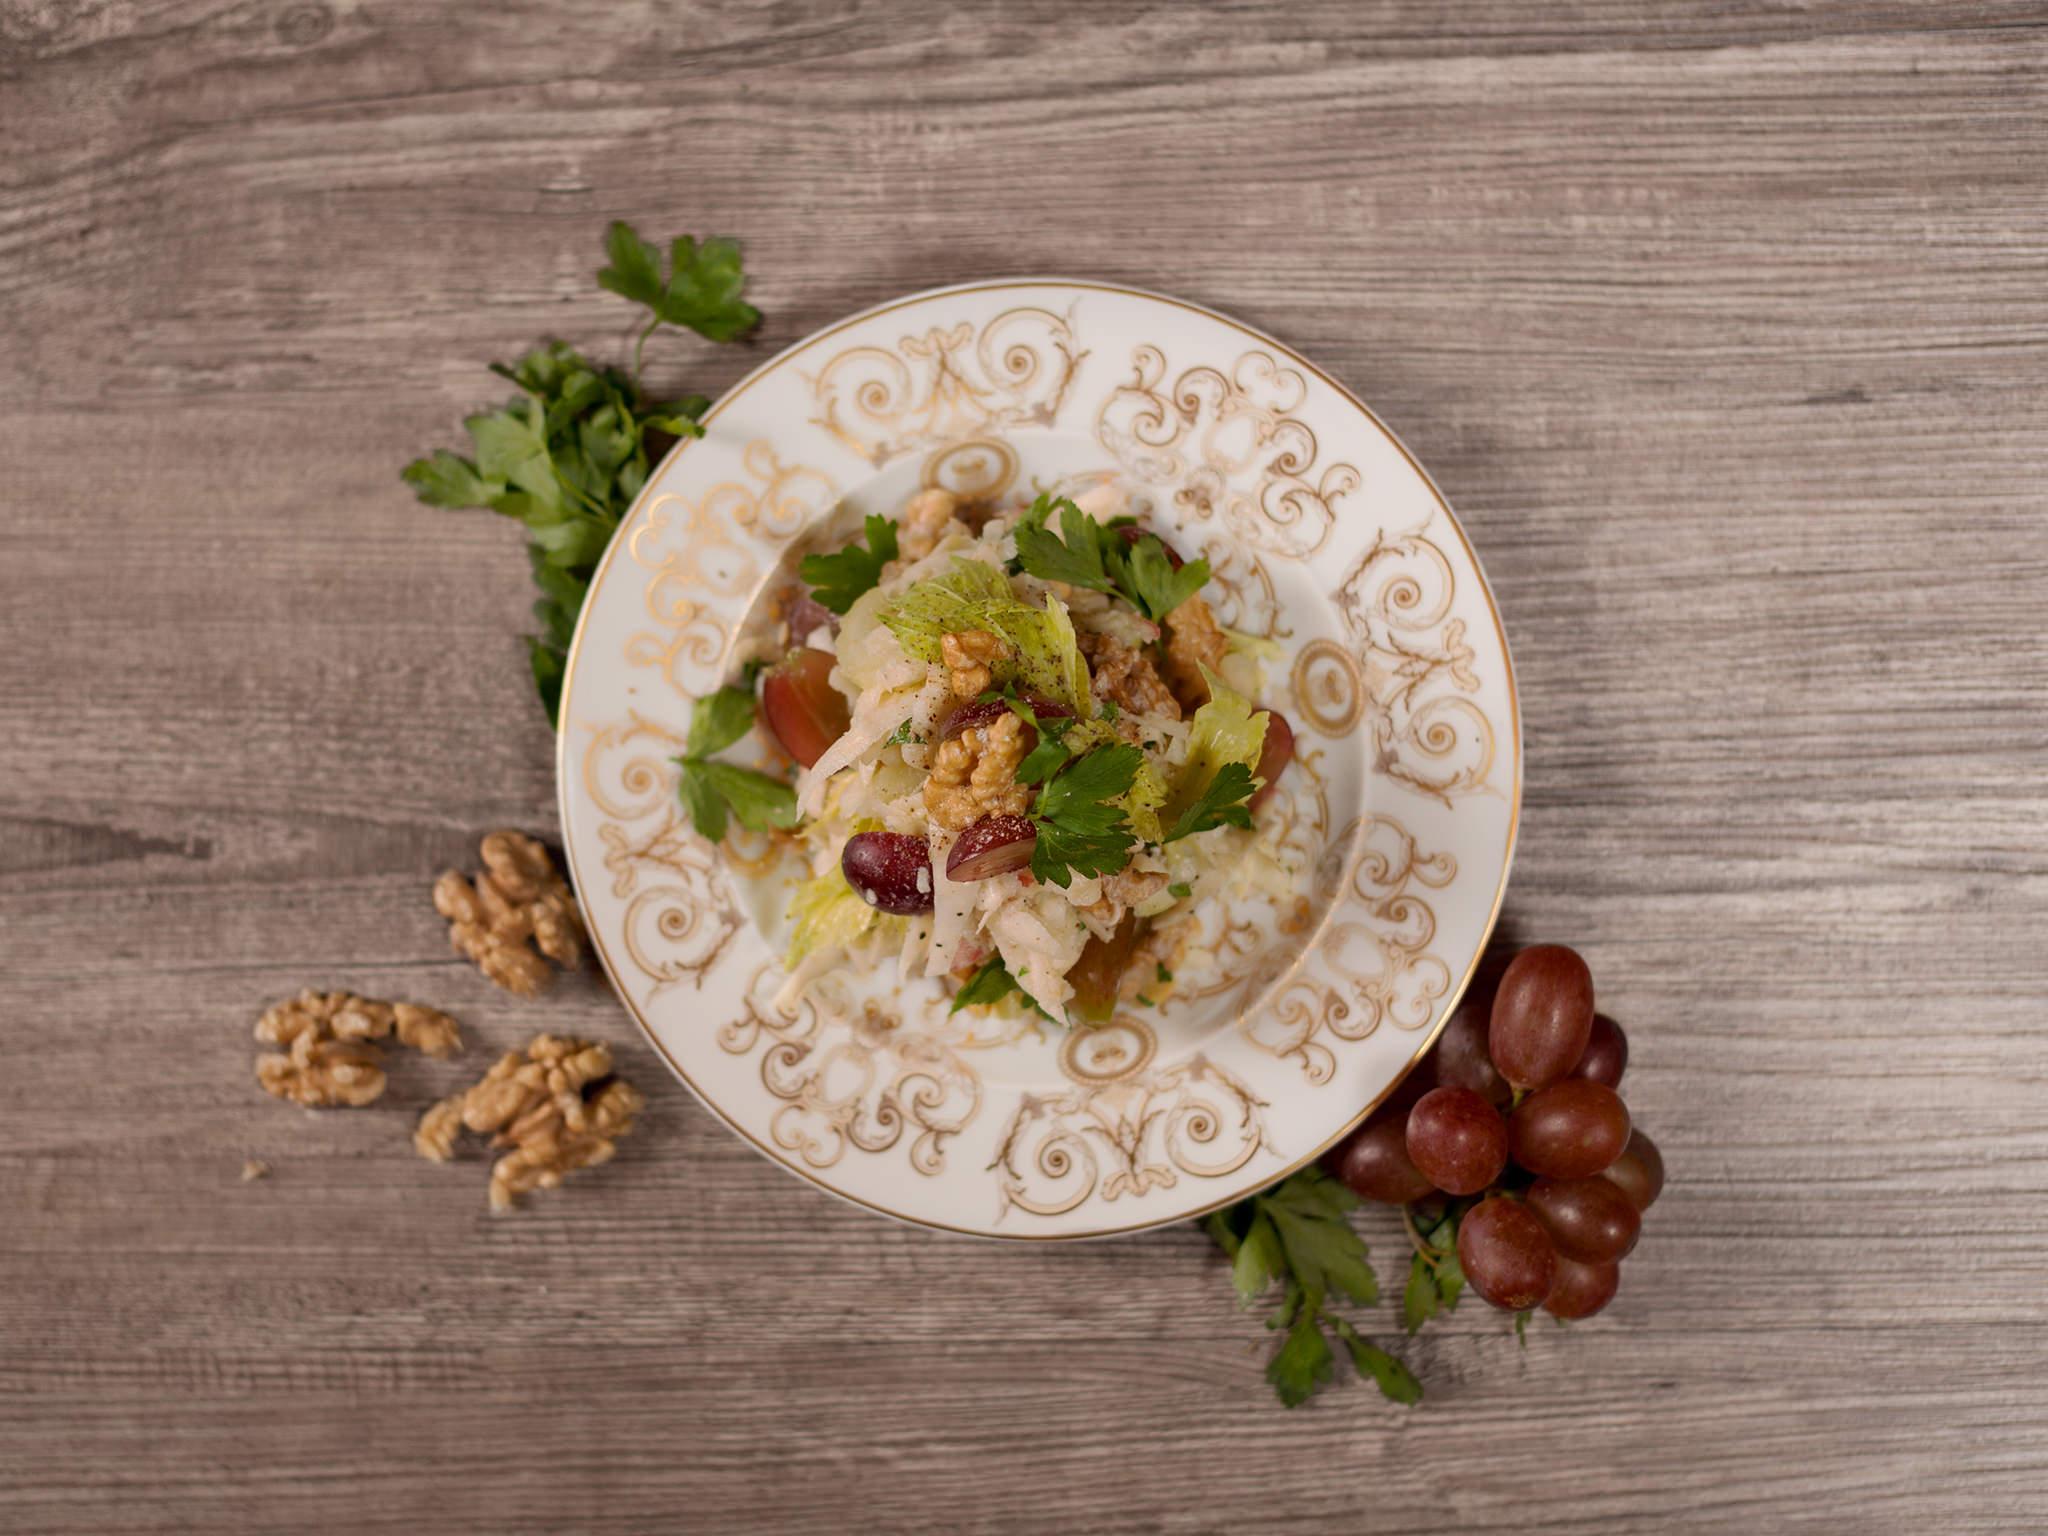 Vegane küche 100 rezepte  vegane küche: 100 rezepte: amazon.de: parragon: bücher. bodyreset ...